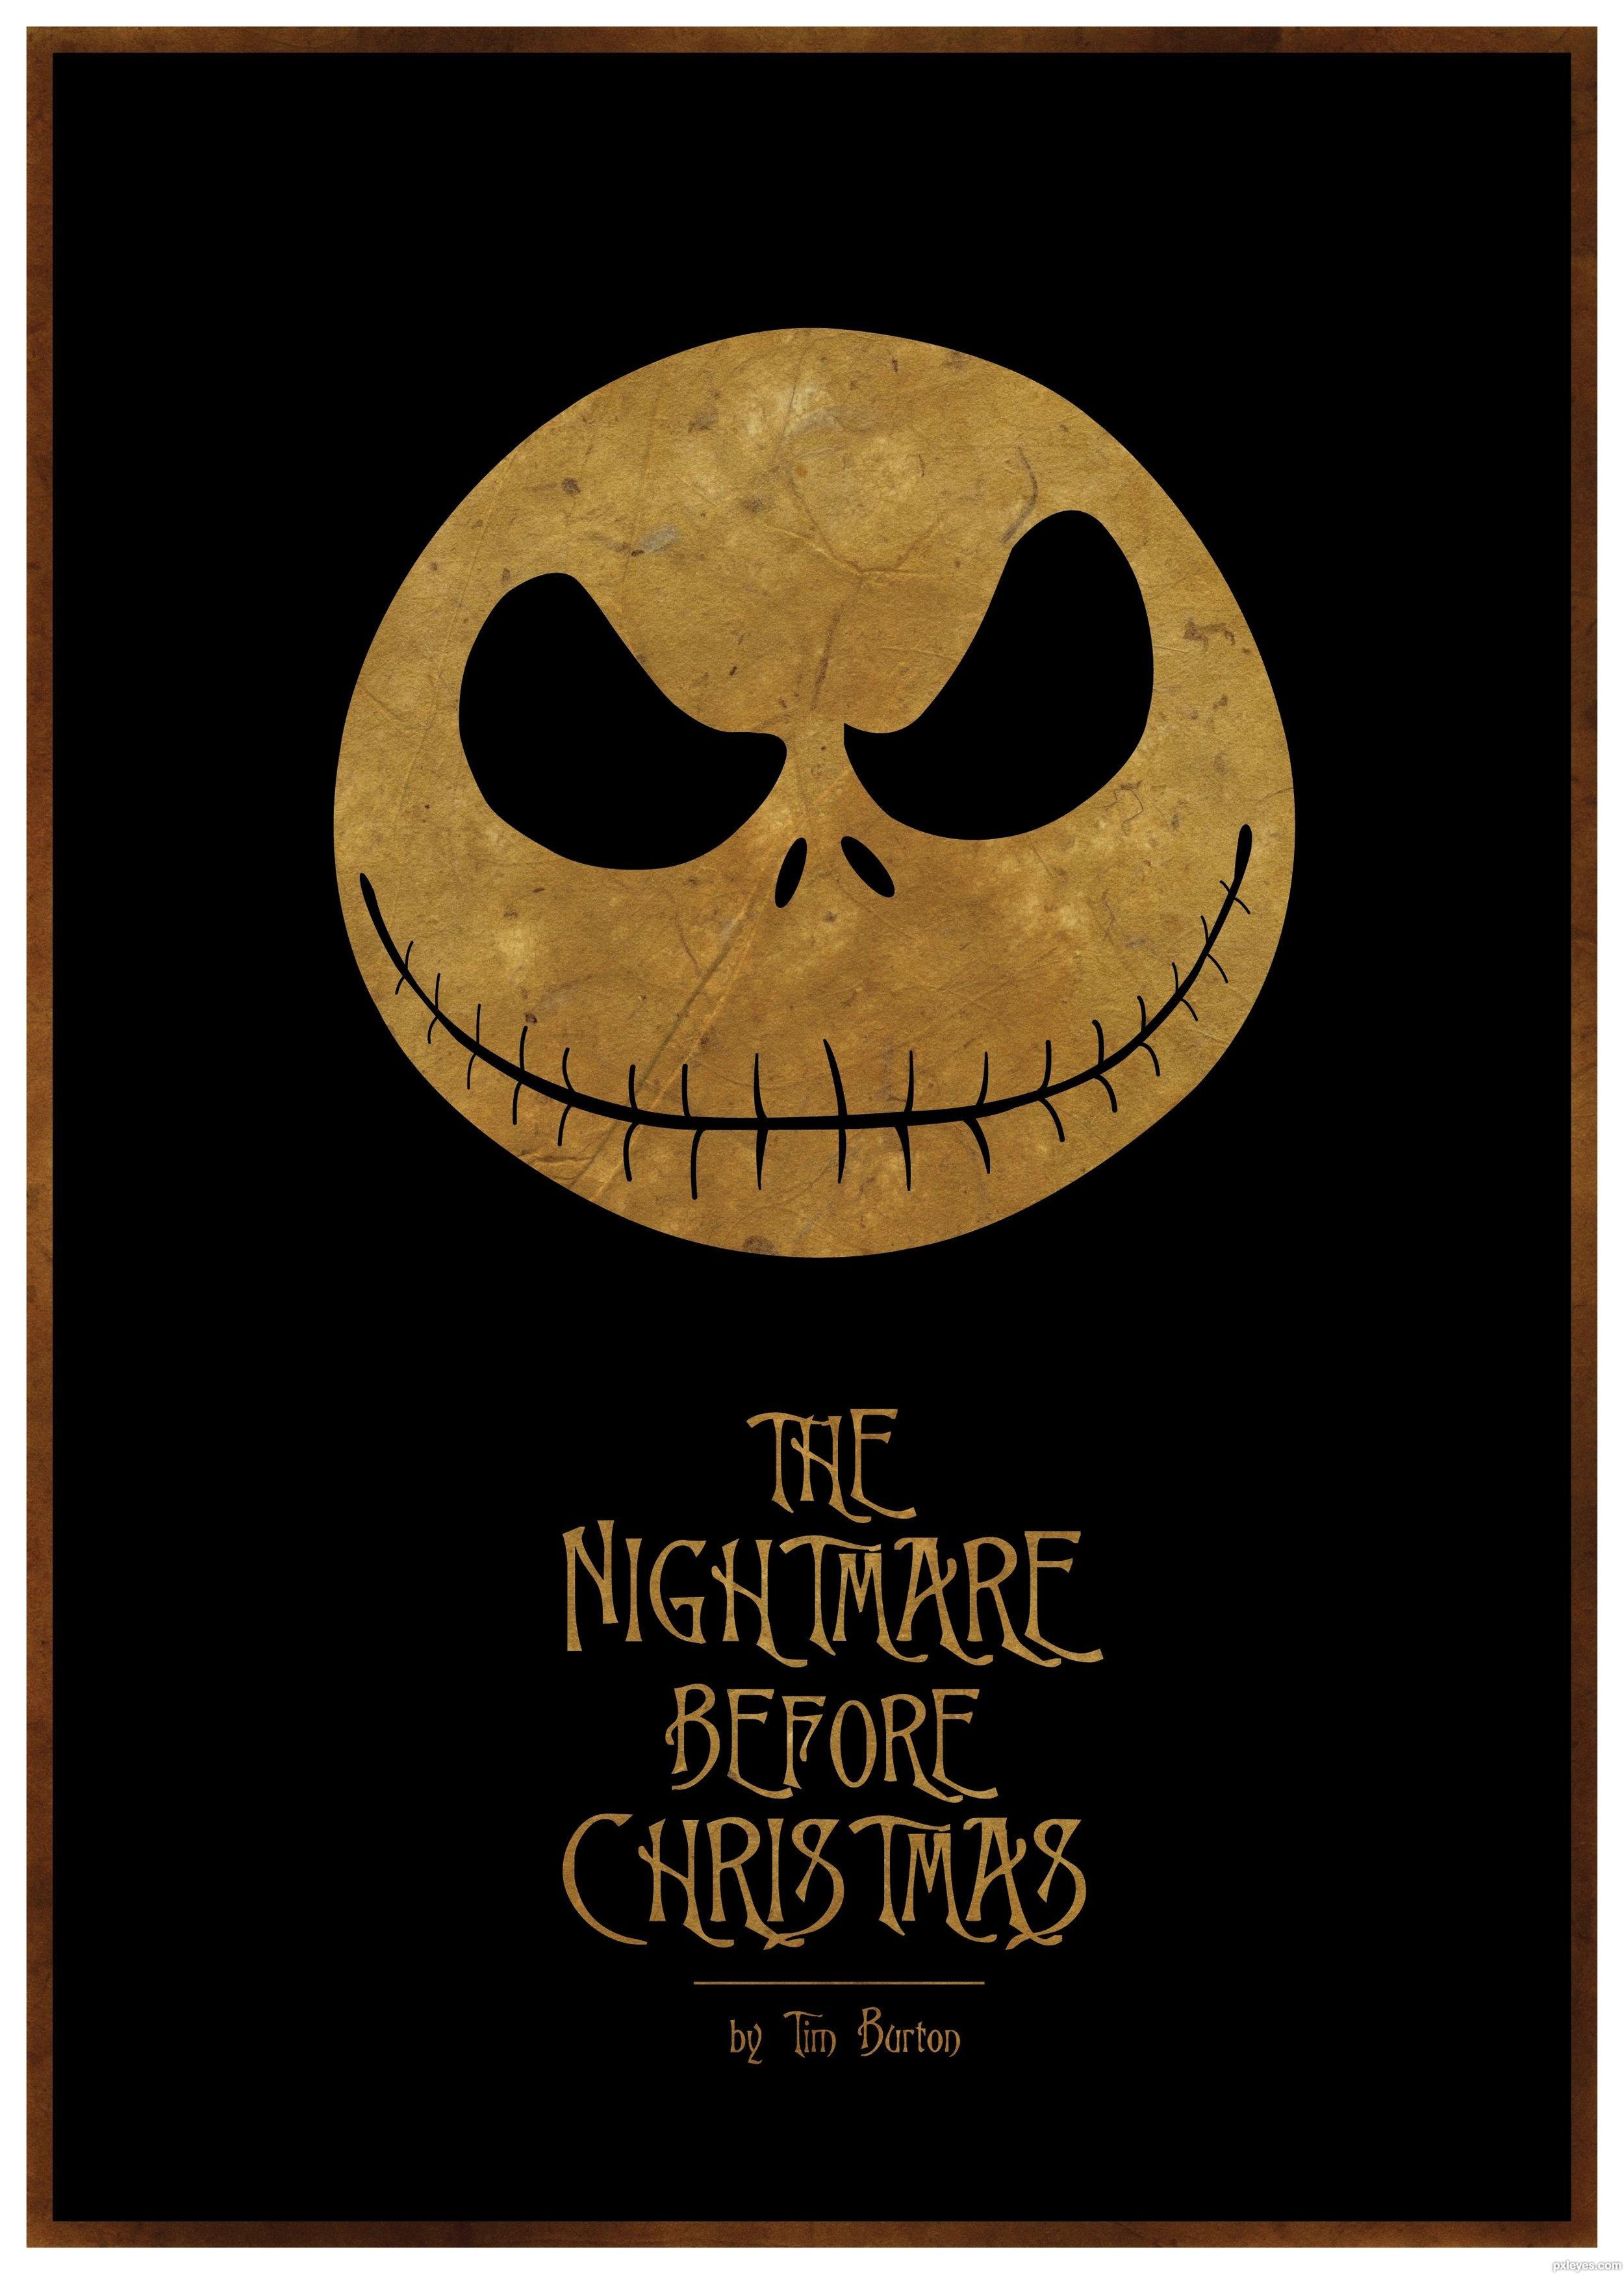 The-Nightmare-Before-Christmas-4e15bb592e82a_hires.jpg